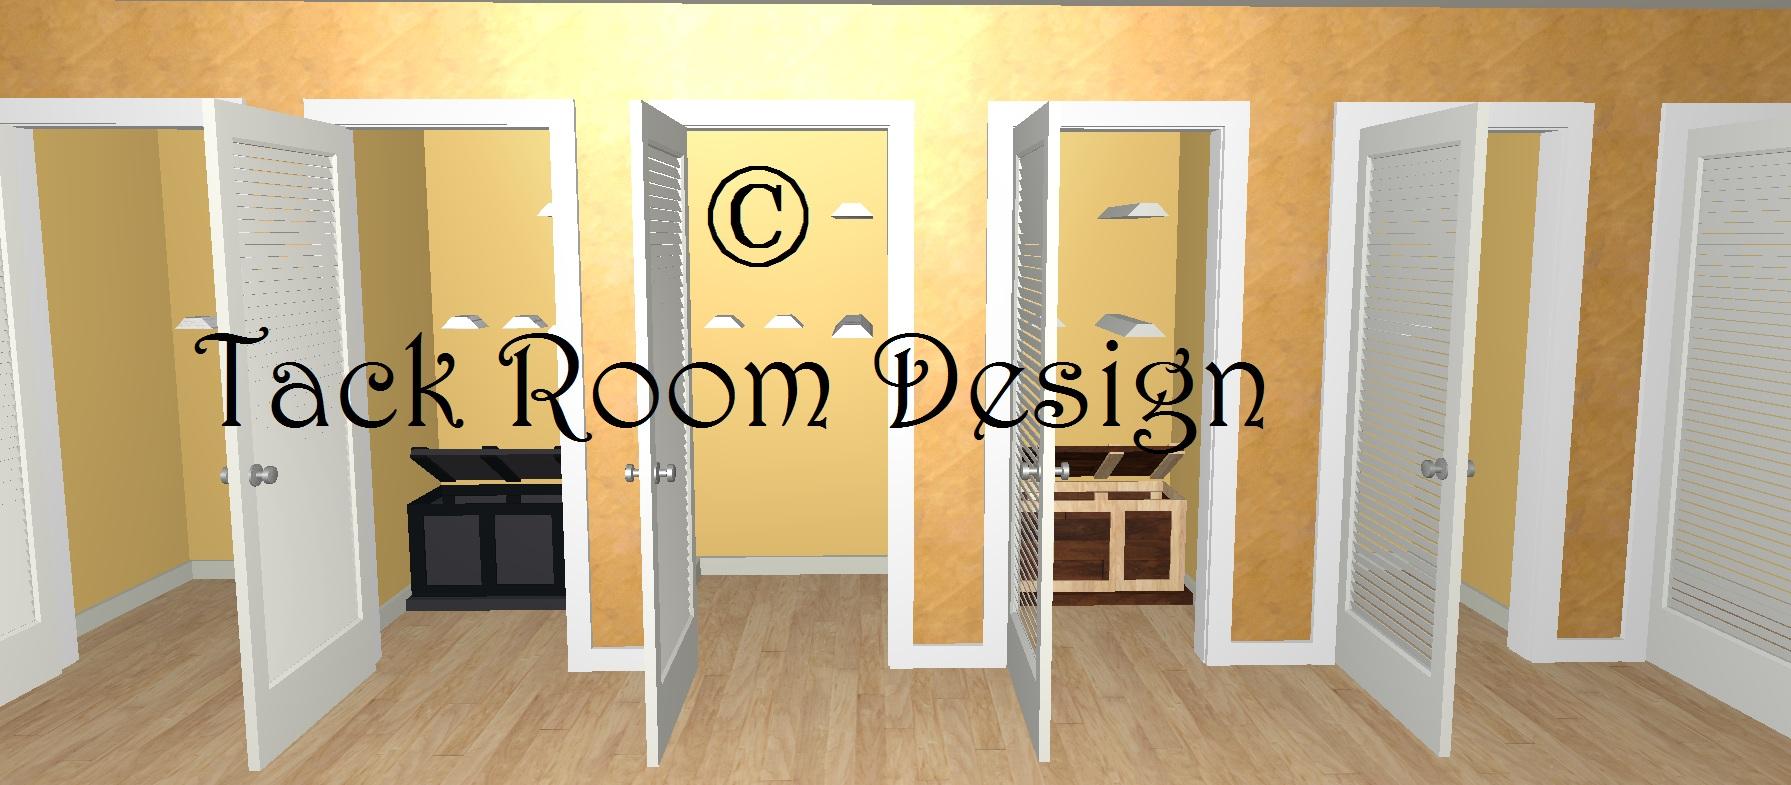 Tack Lockers Moxie Designs Tack Room Design